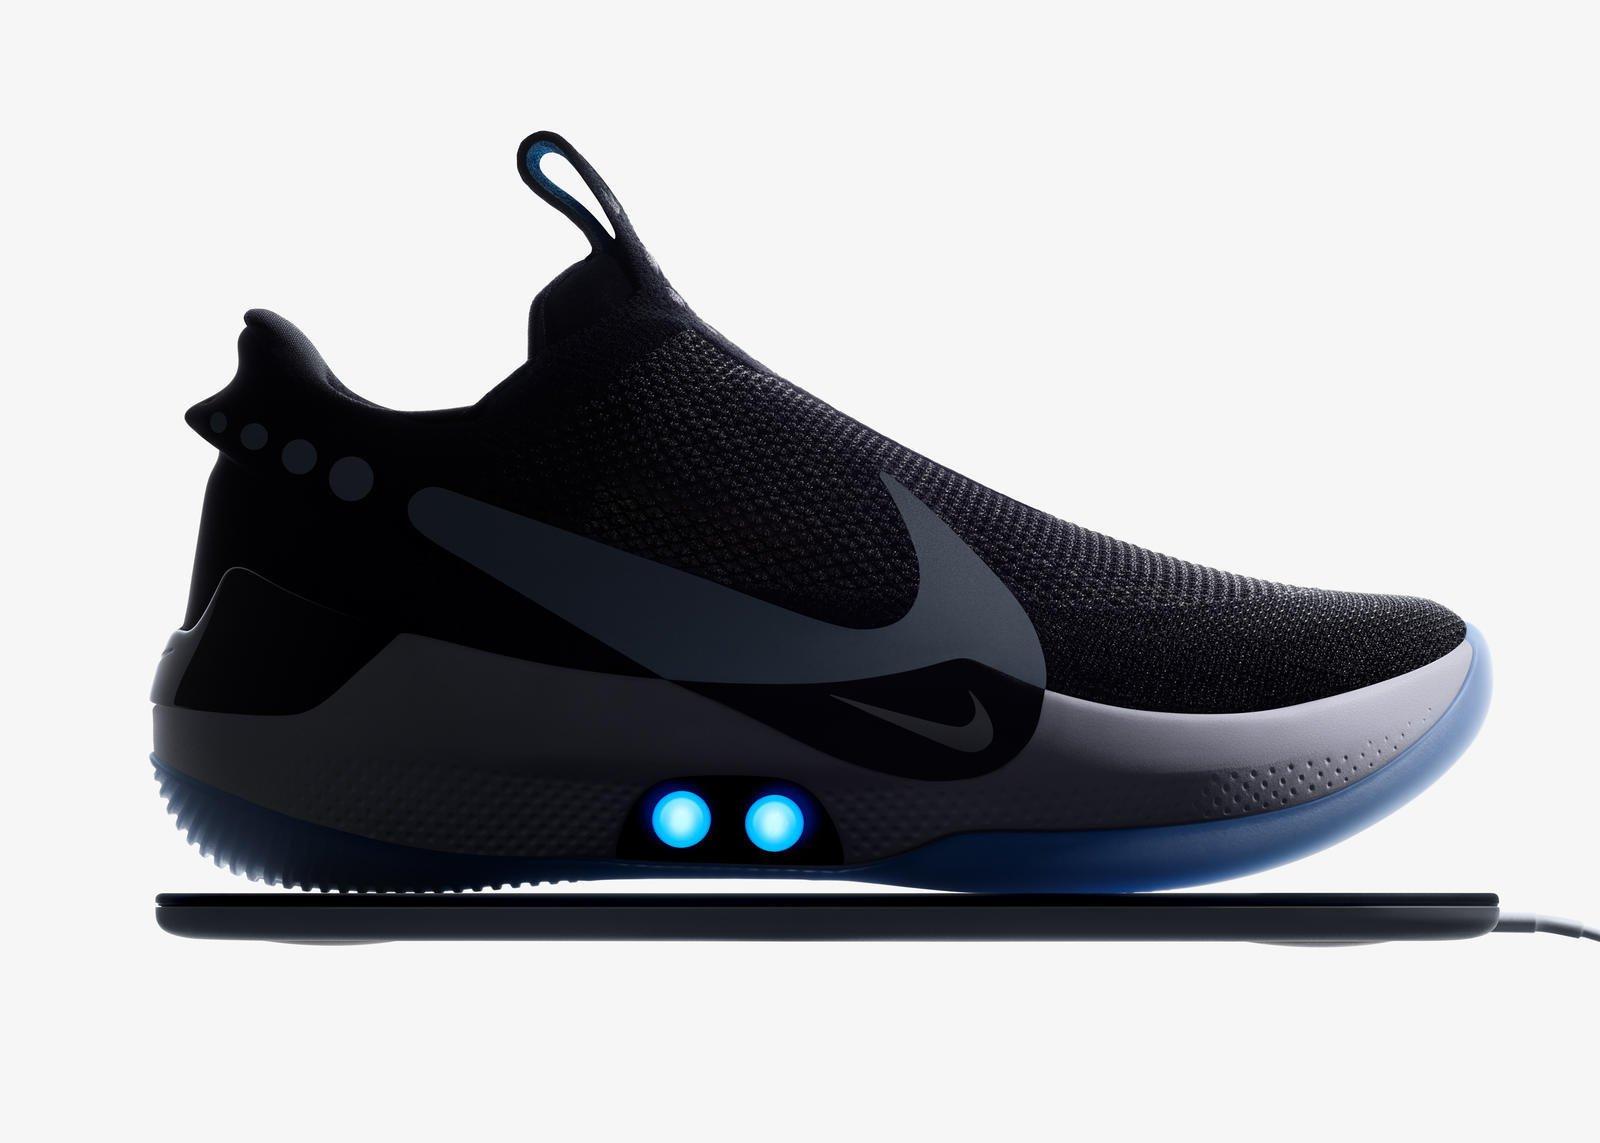 Nike's self-lacing trainers break just